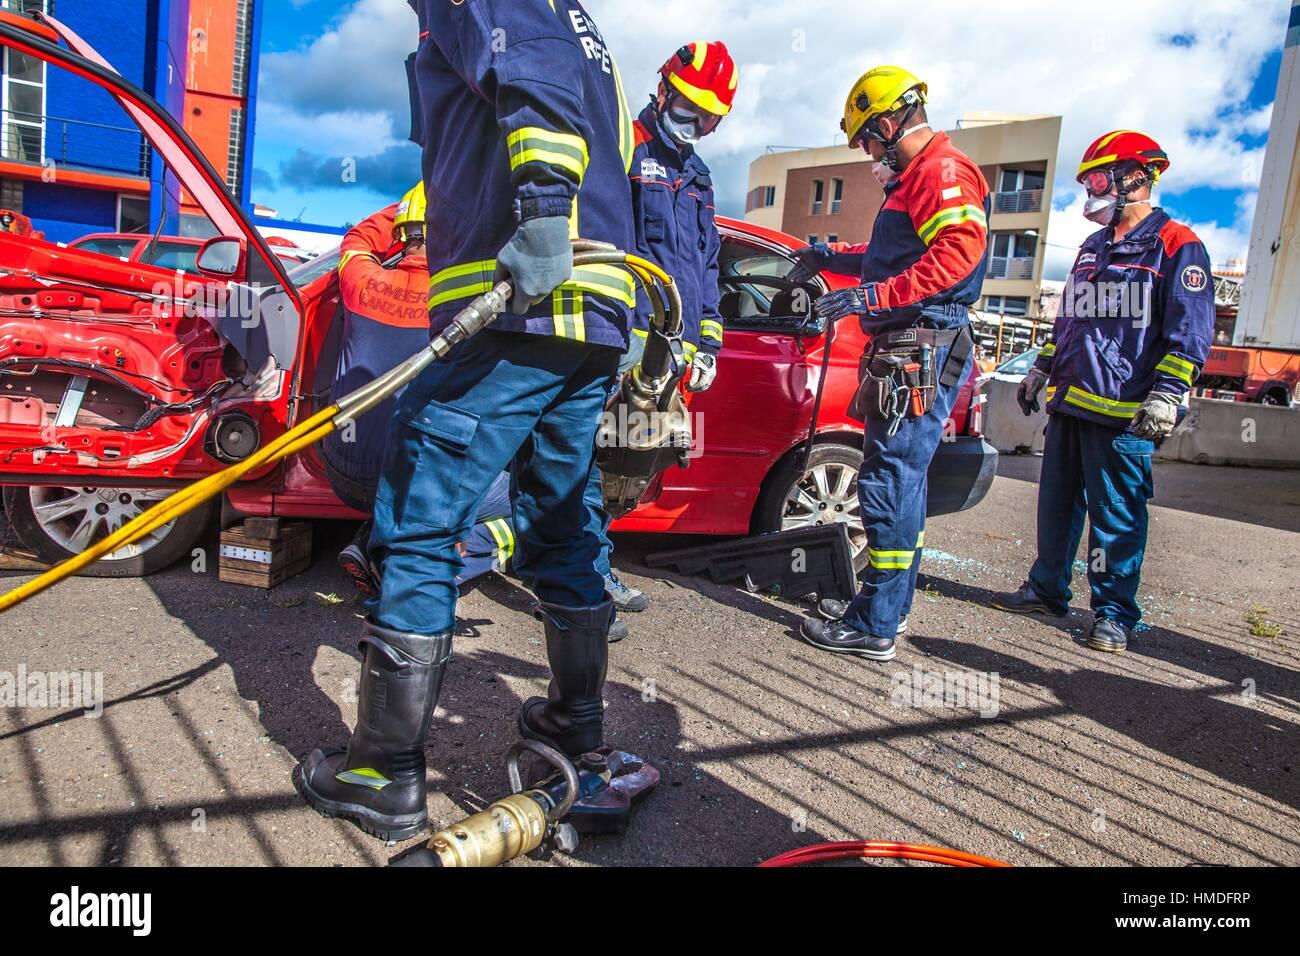 Firemen Manoeuvre in the fire station of San Cristobal de La Laguna - Stock Image